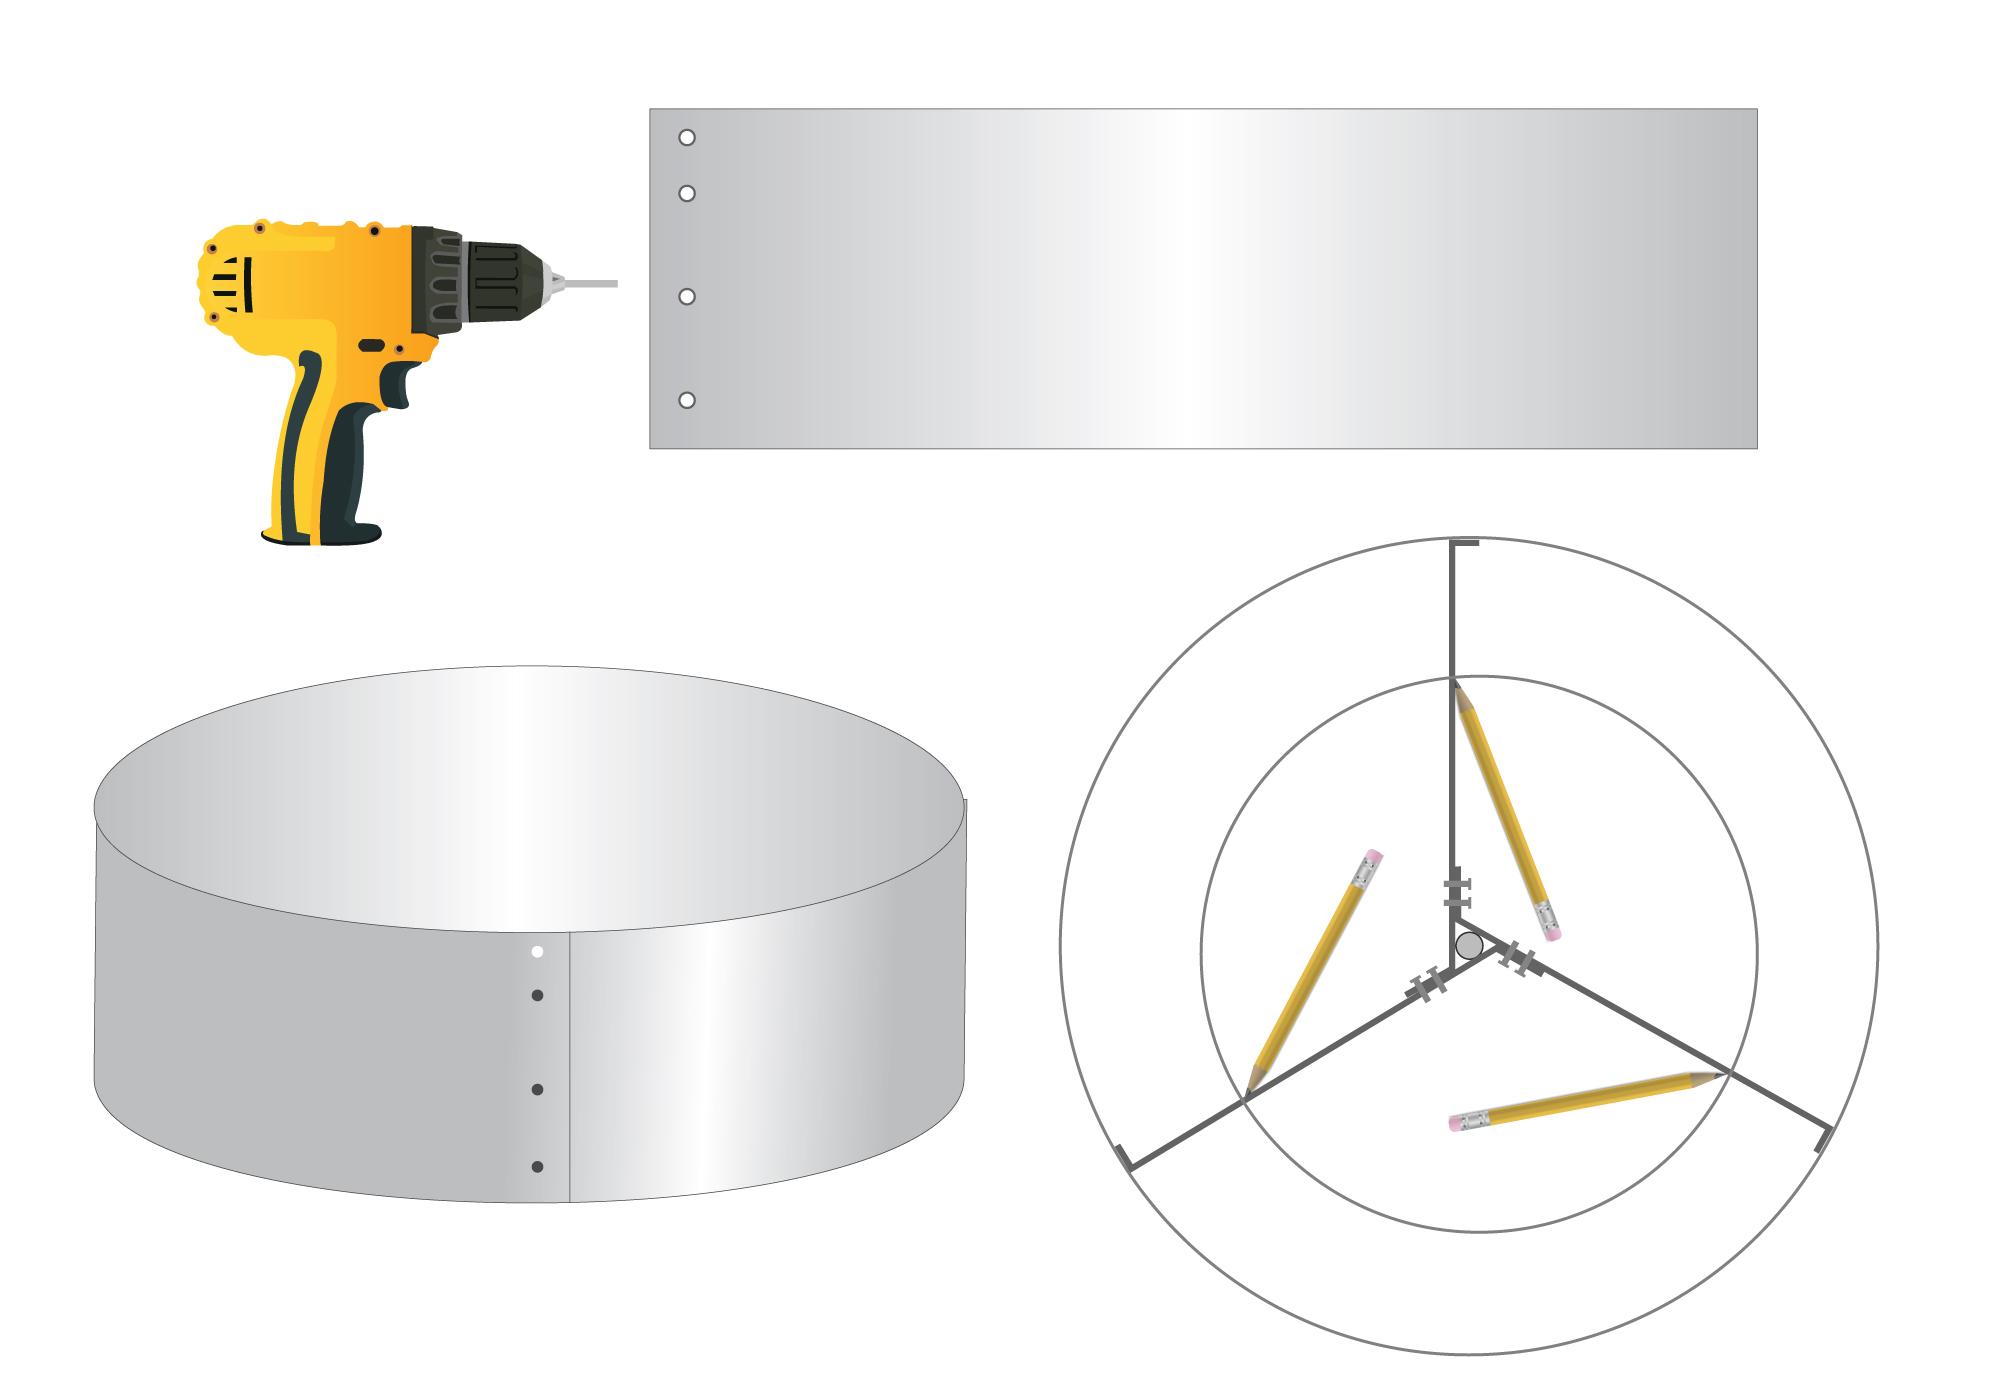 constructing a pendant light